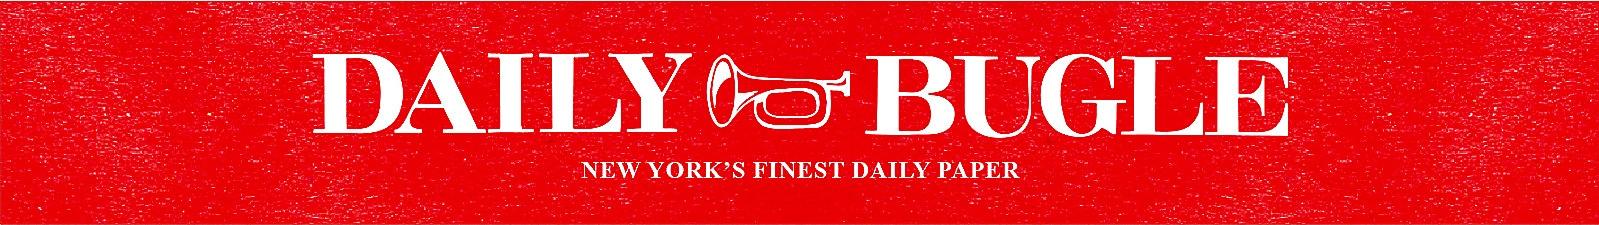 daily bugle заглавна част